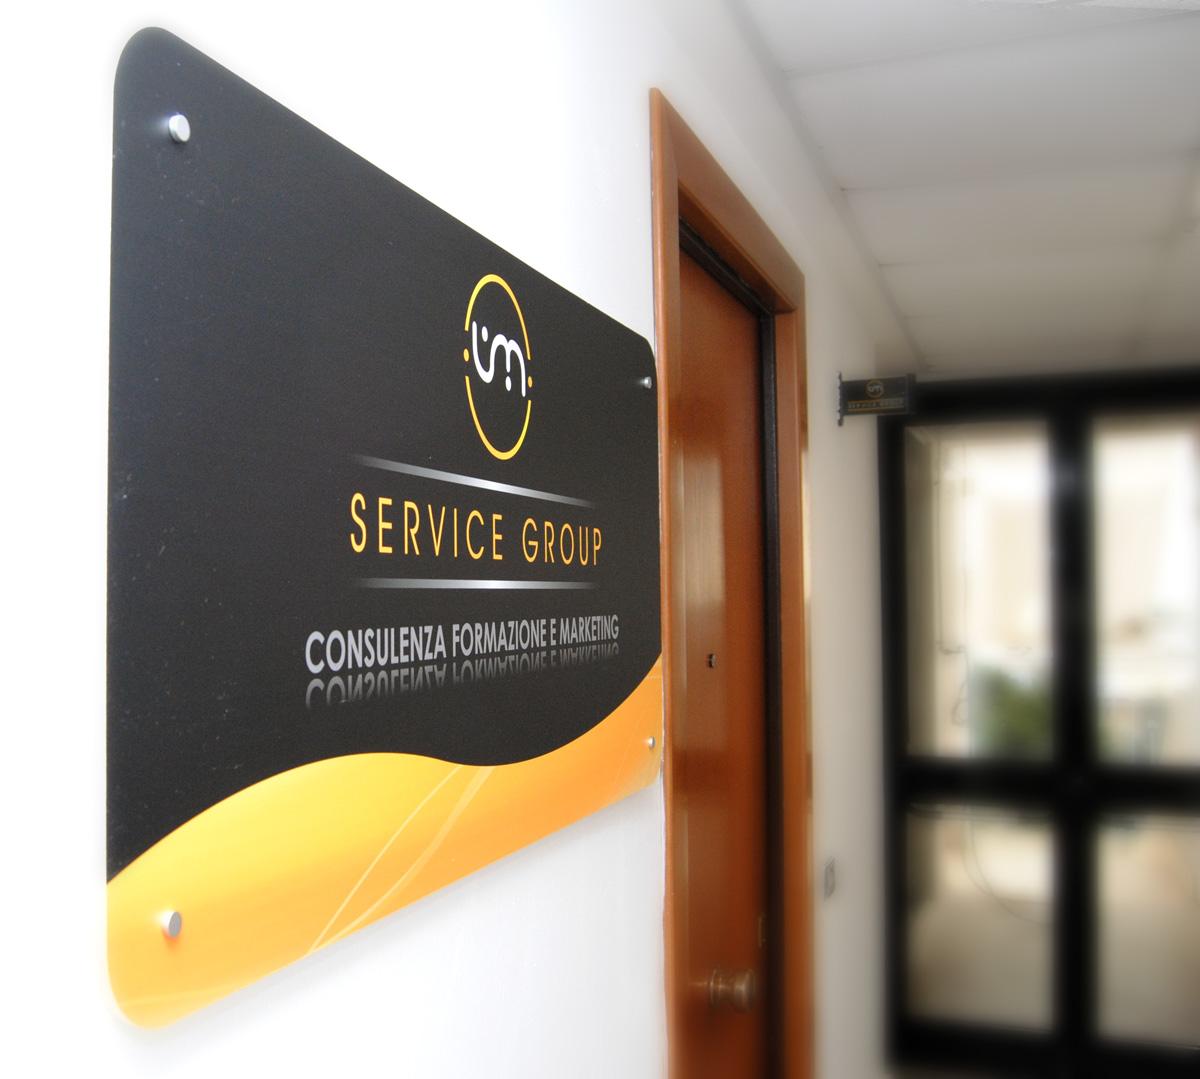 VM Services Group Targa by Maniac Studio